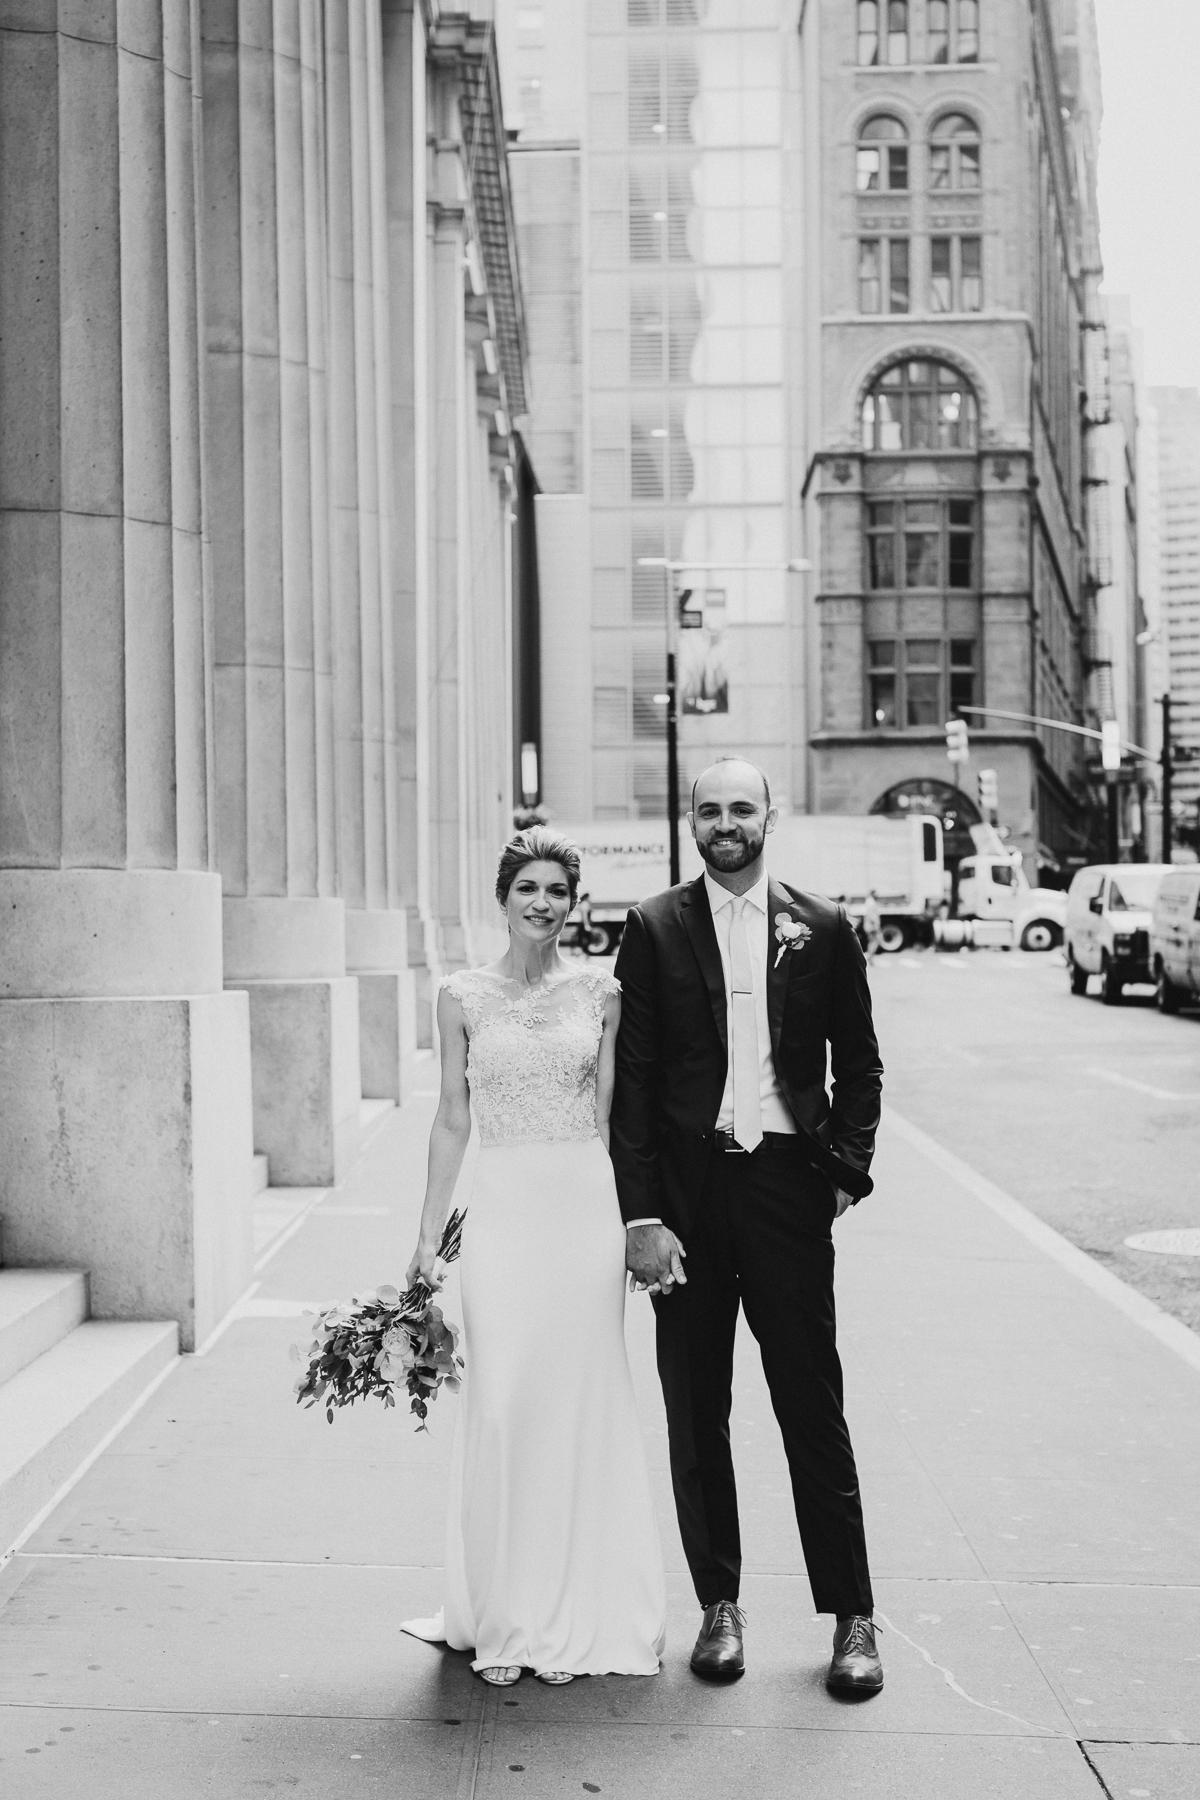 Frankies-457-Spuntino-Intimate-Brooklyn-Restaurant-Wedding-Photographer-23.jpg